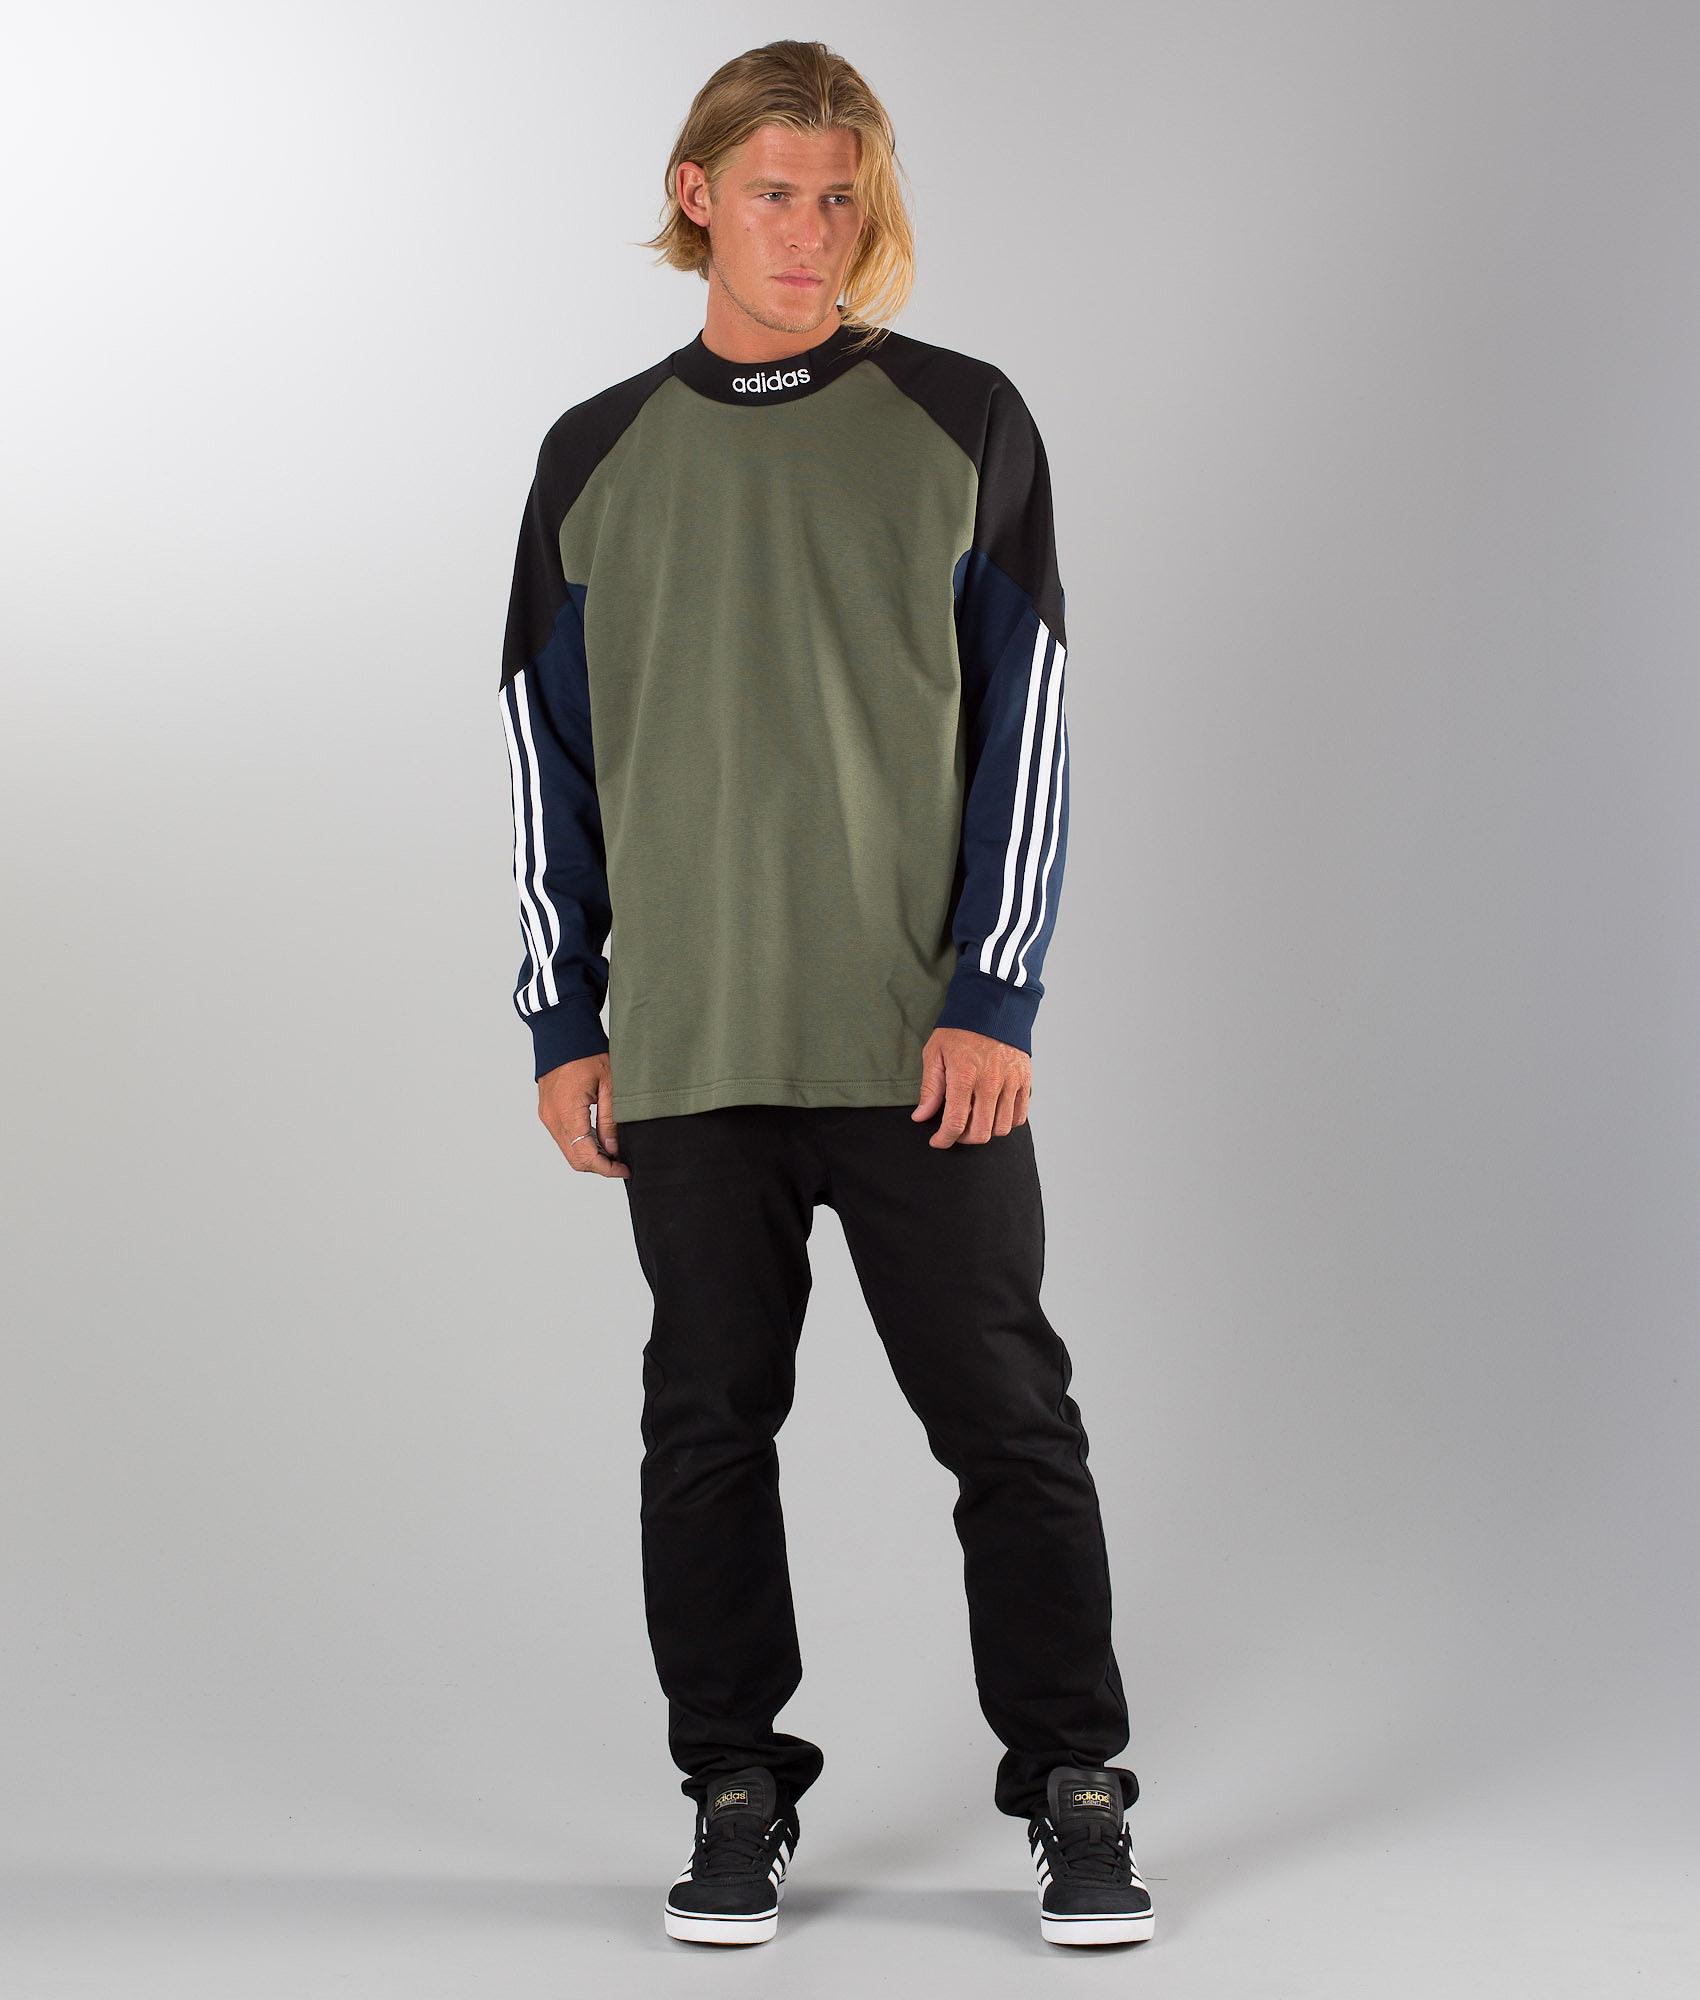 0bc392e5e14 Adidas Skateboarding Goalie Sweater Base Green Black Collgegiate ...